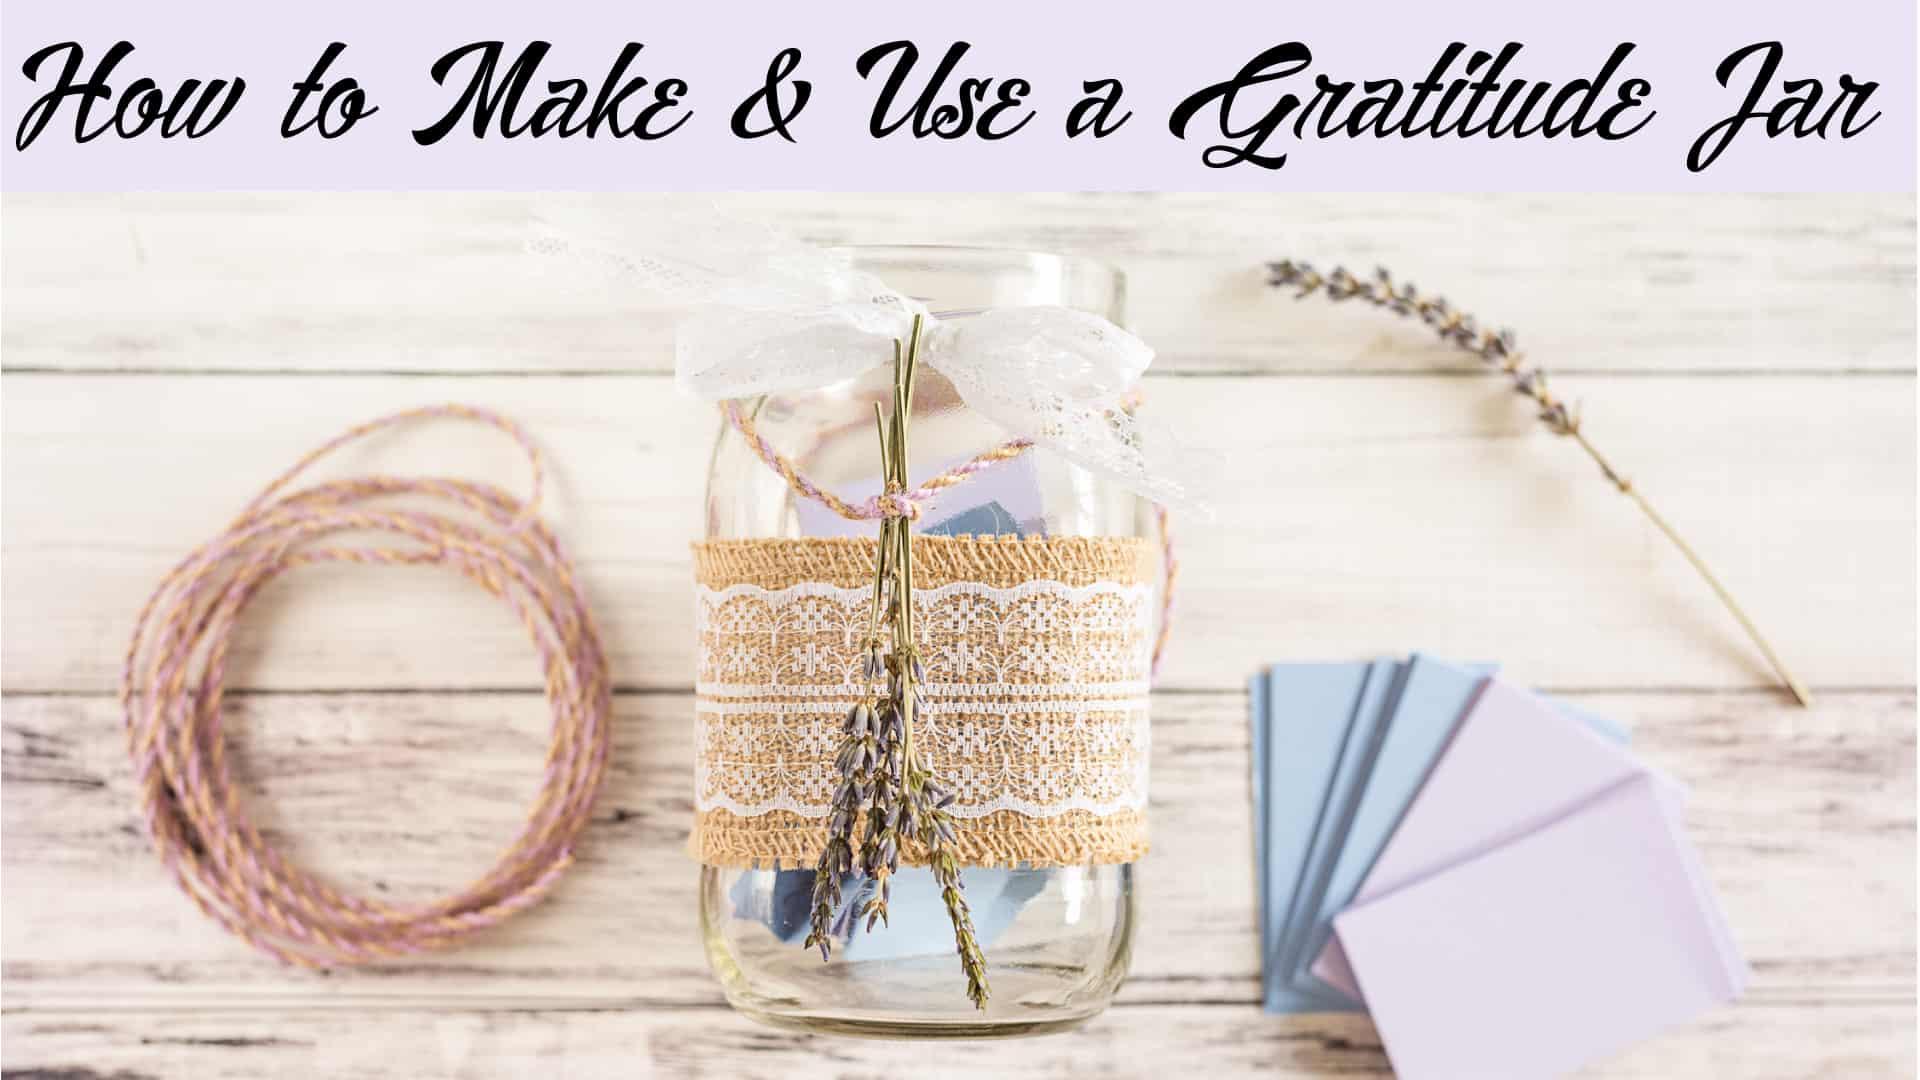 How to Make and Use a Gratitude Jar